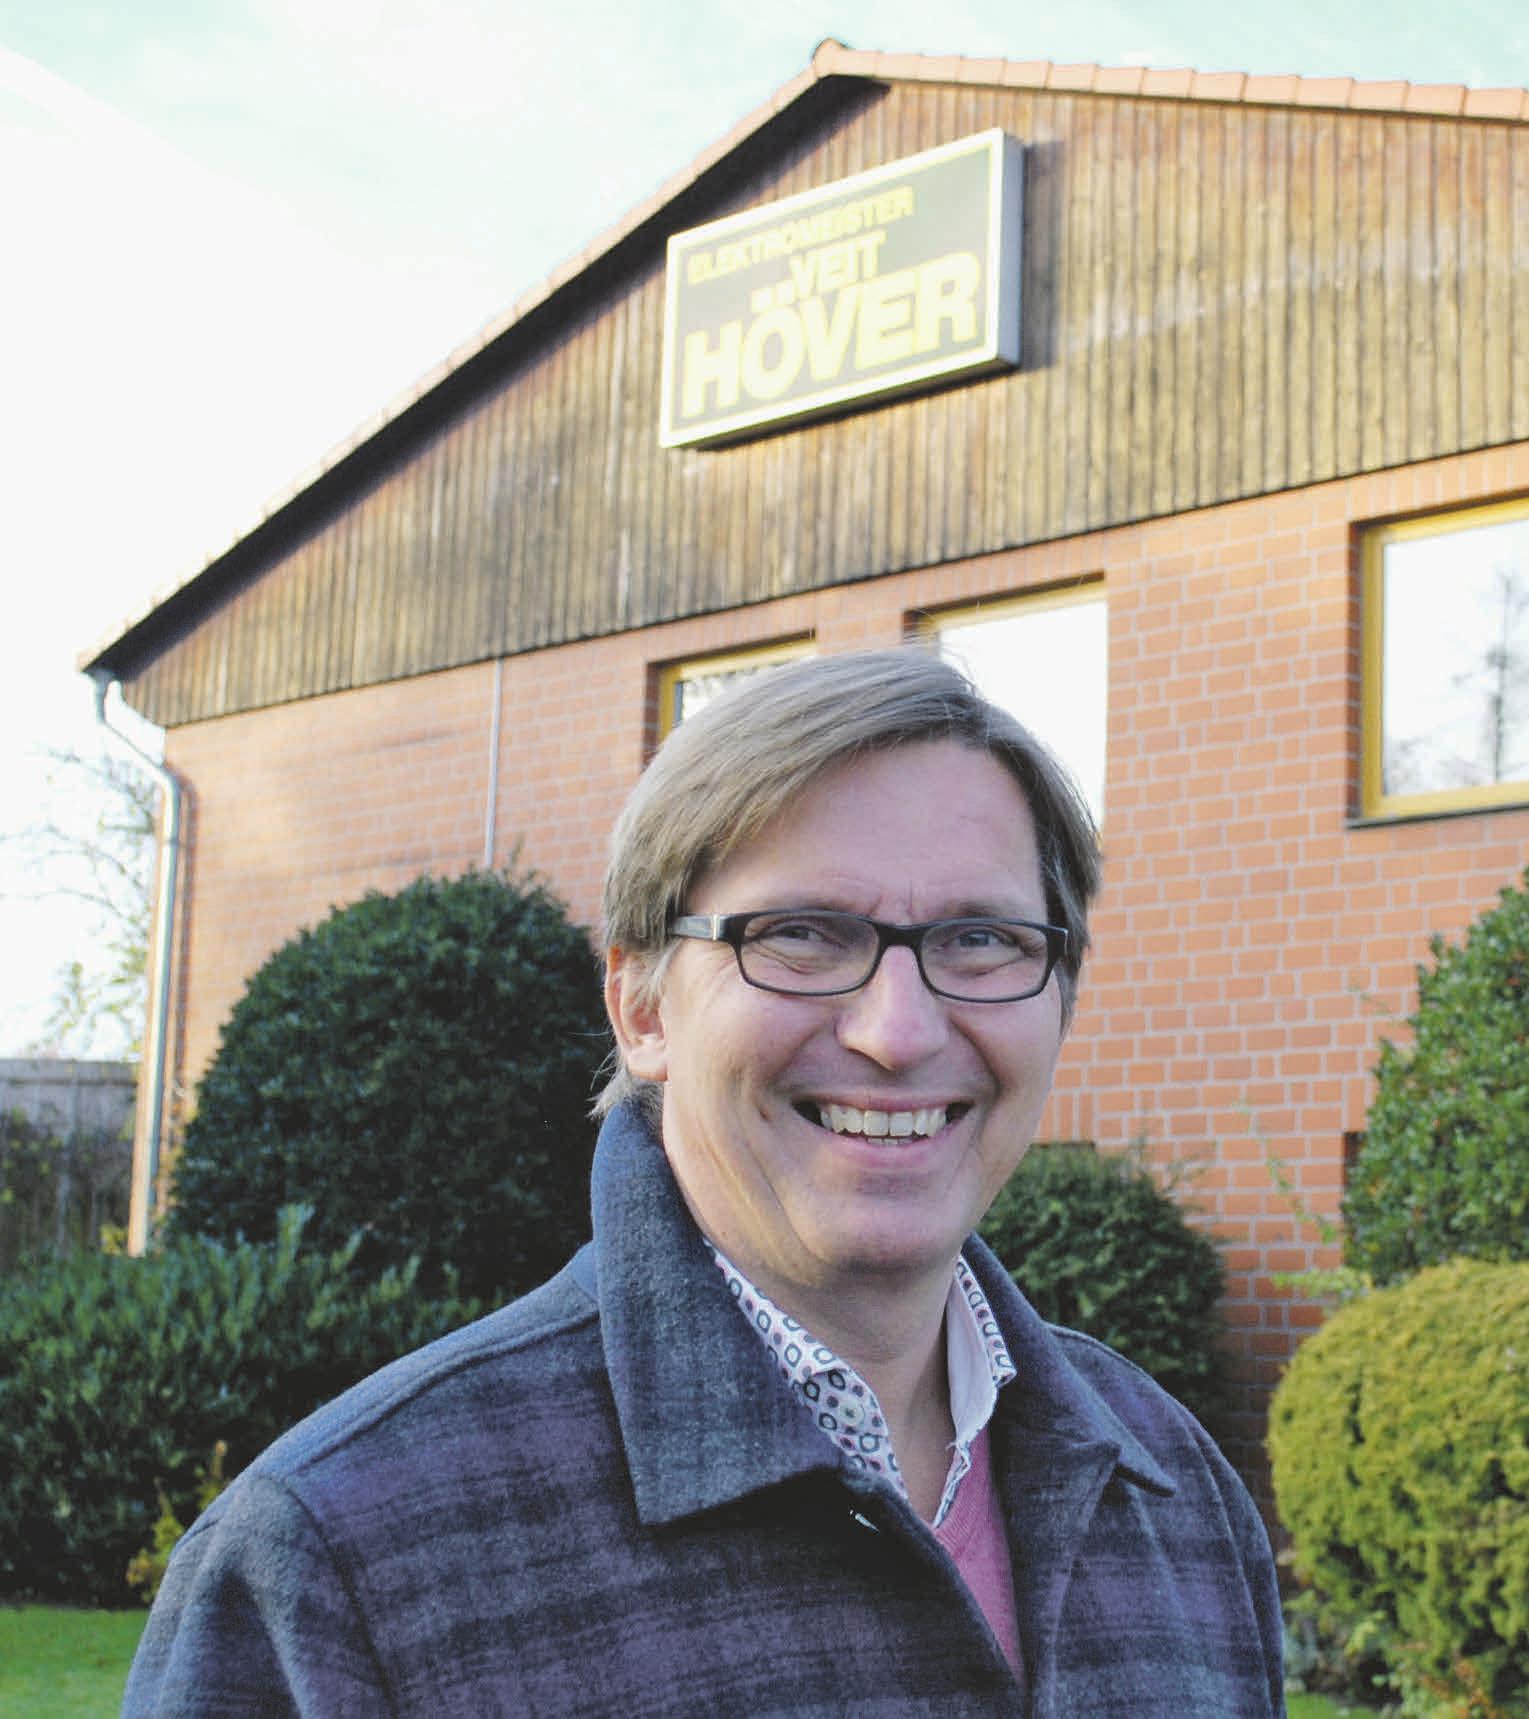 Seit 1997 ist Jens Krause in dem Traditionsbetrieb tätig. Foto: Birthe Kußroll-Ihle